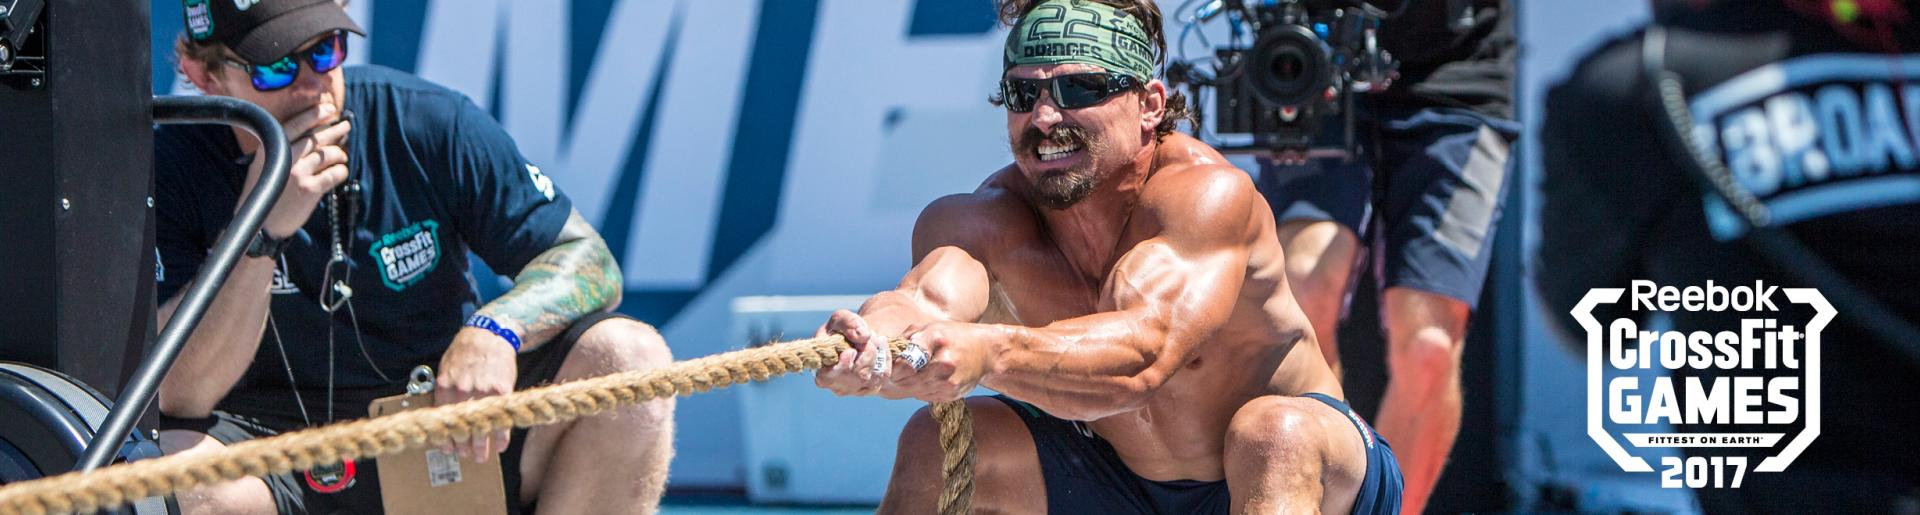 CrossFit 2017: Rope Pull